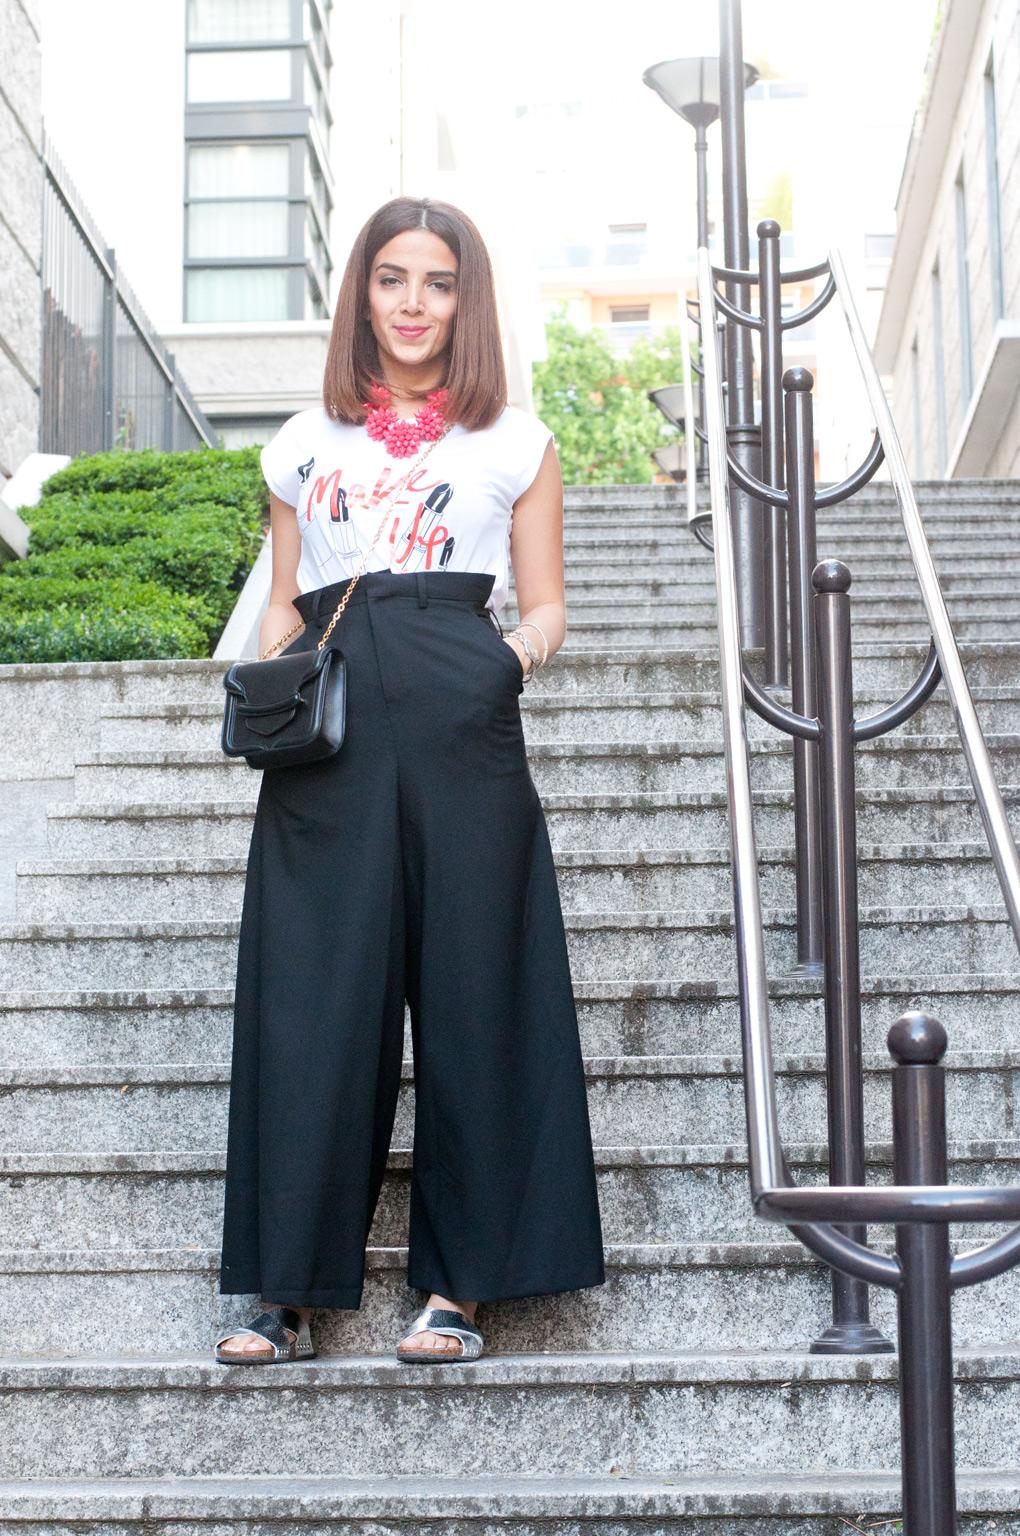 Lyla_Loves_Fashion_Junya_Watanabe_Trousers_Stella_McCartney_Tshirt_5923